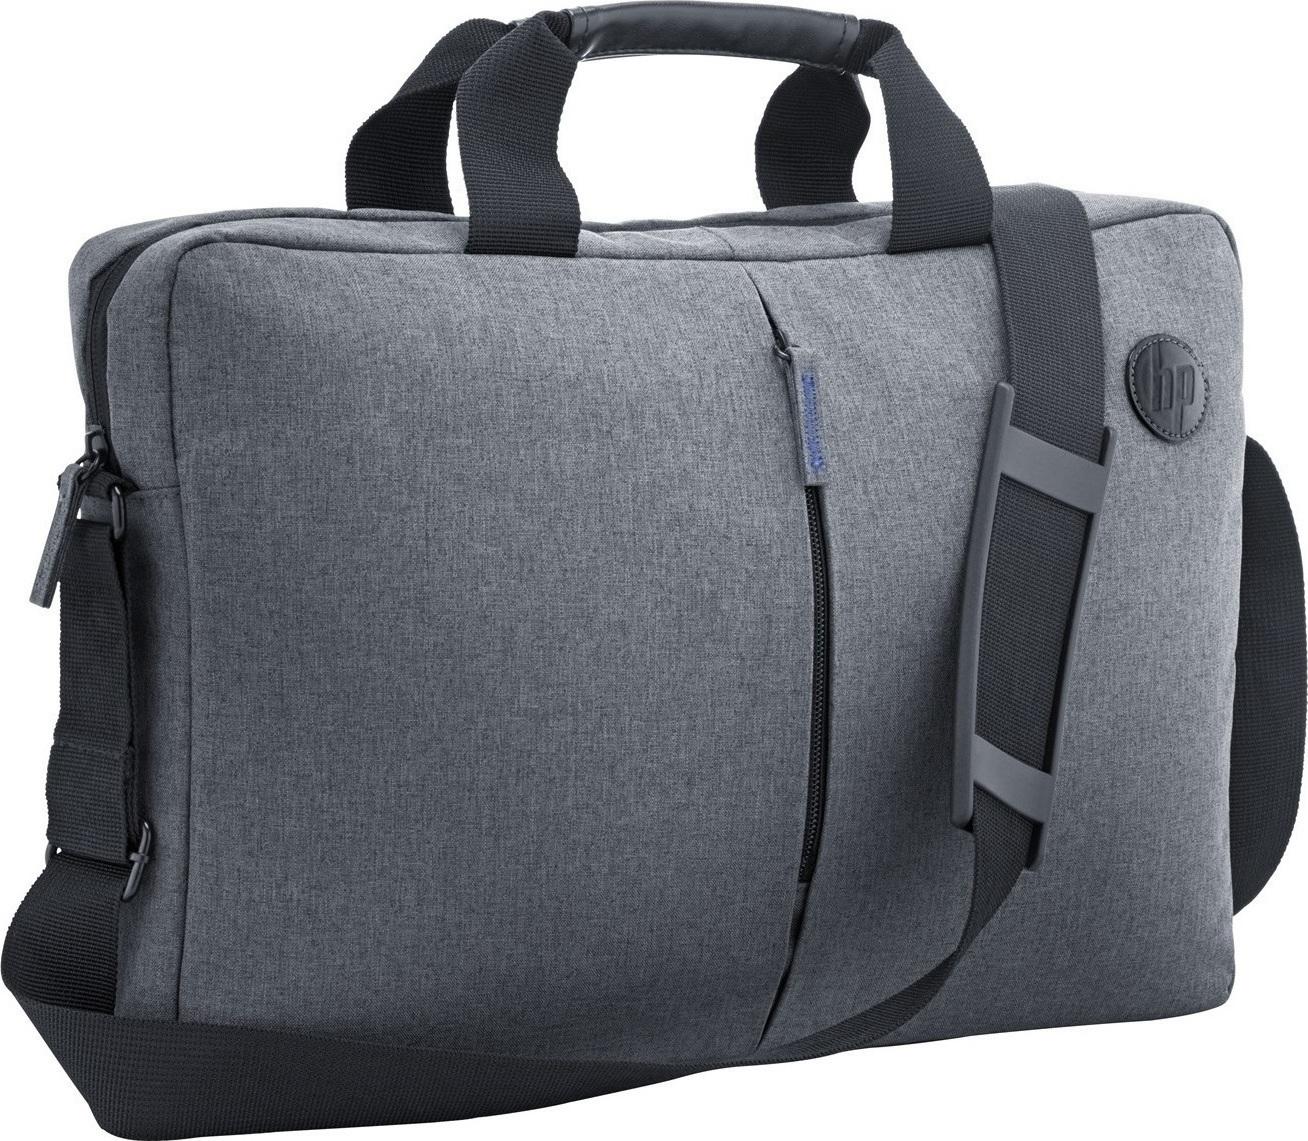 3c1f15c231 Τσάντες Laptop - Skroutz.gr